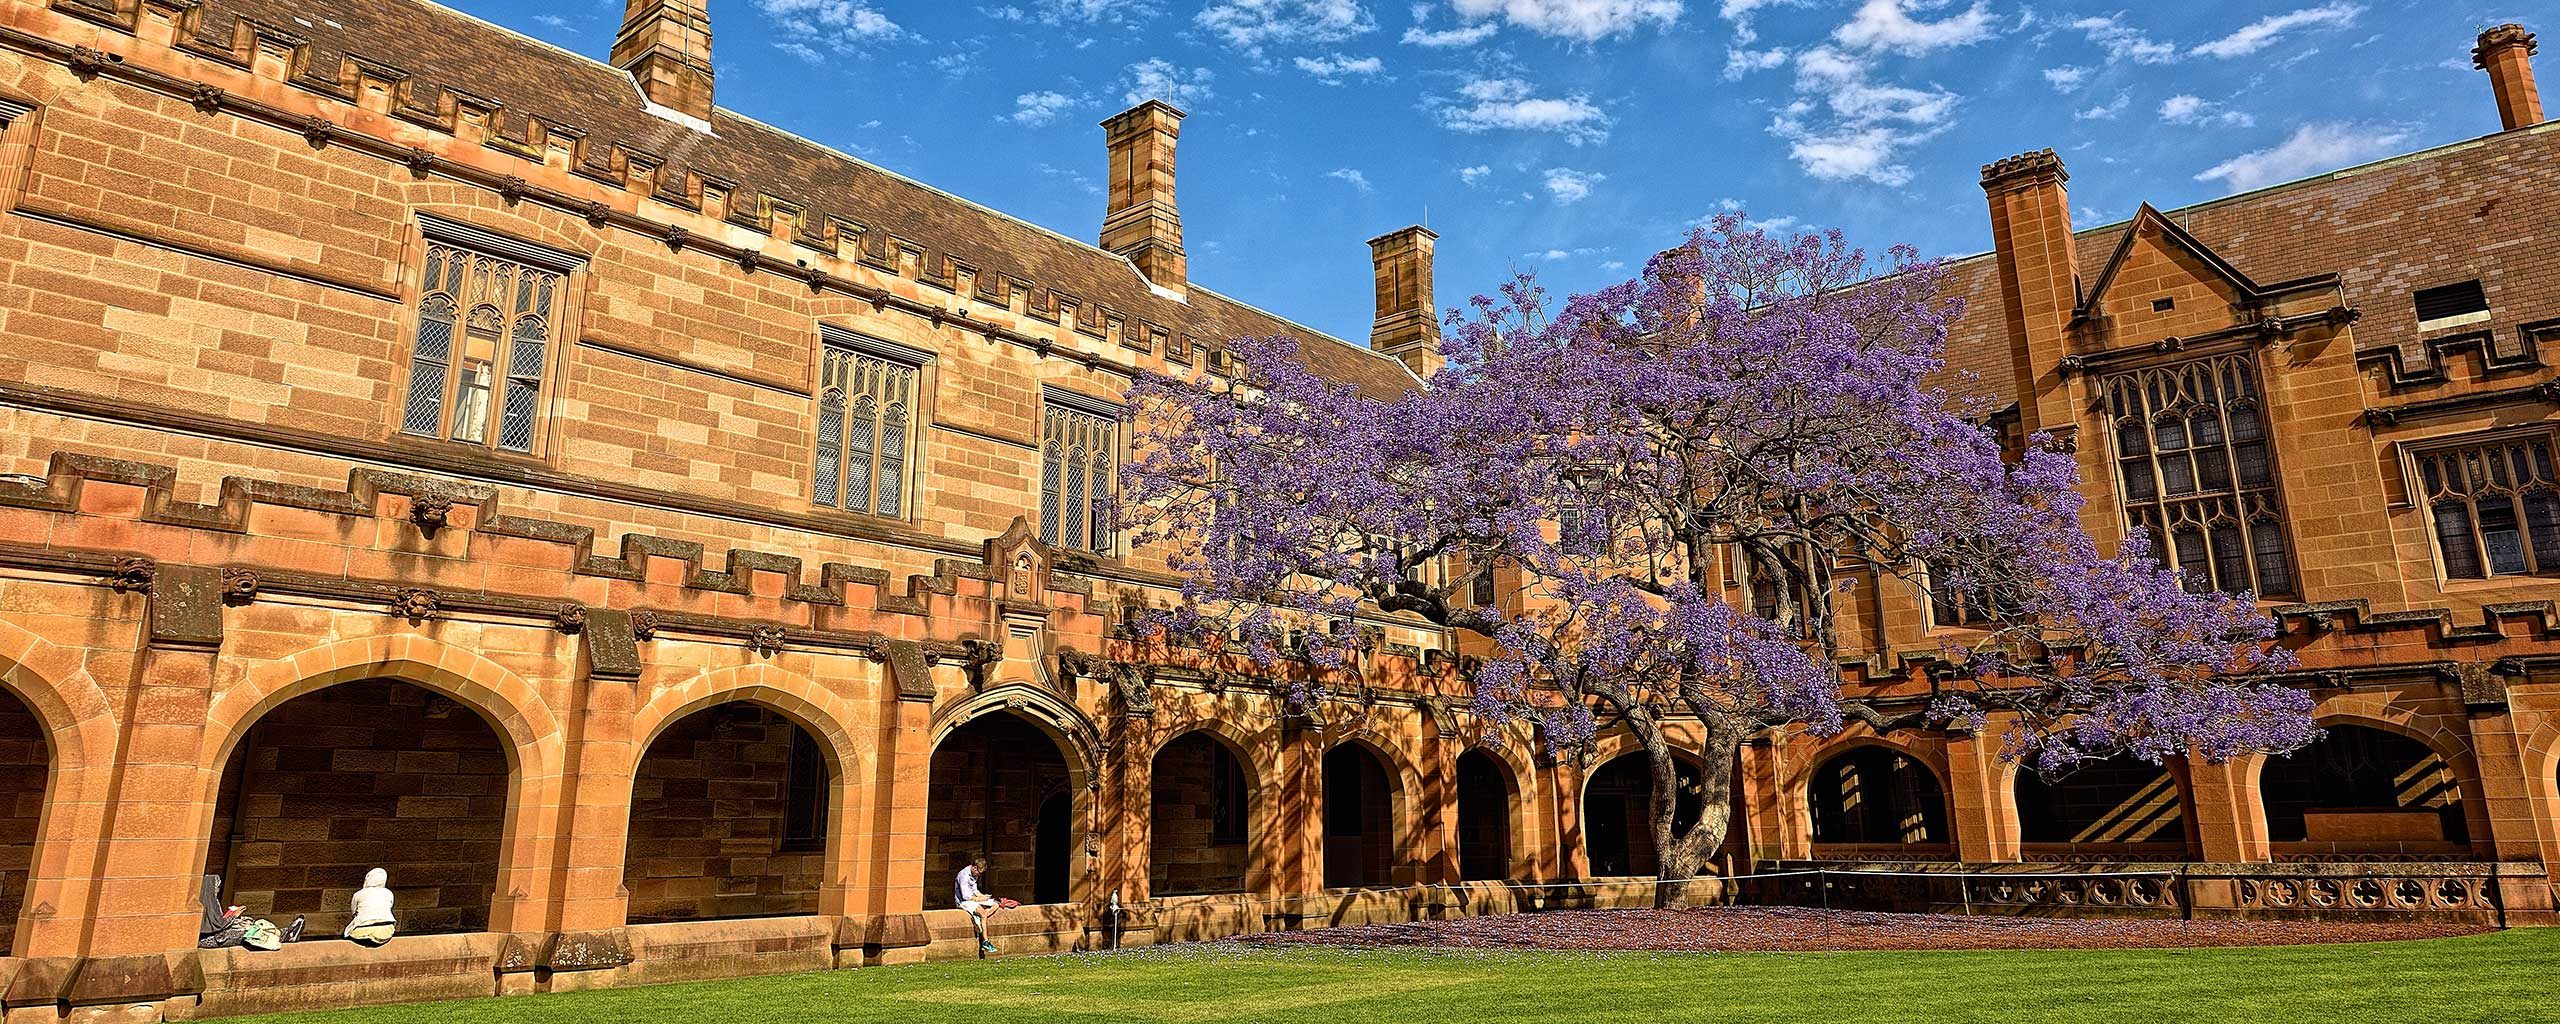 University of Sydney Quadrangle building with purple tree in courtyard